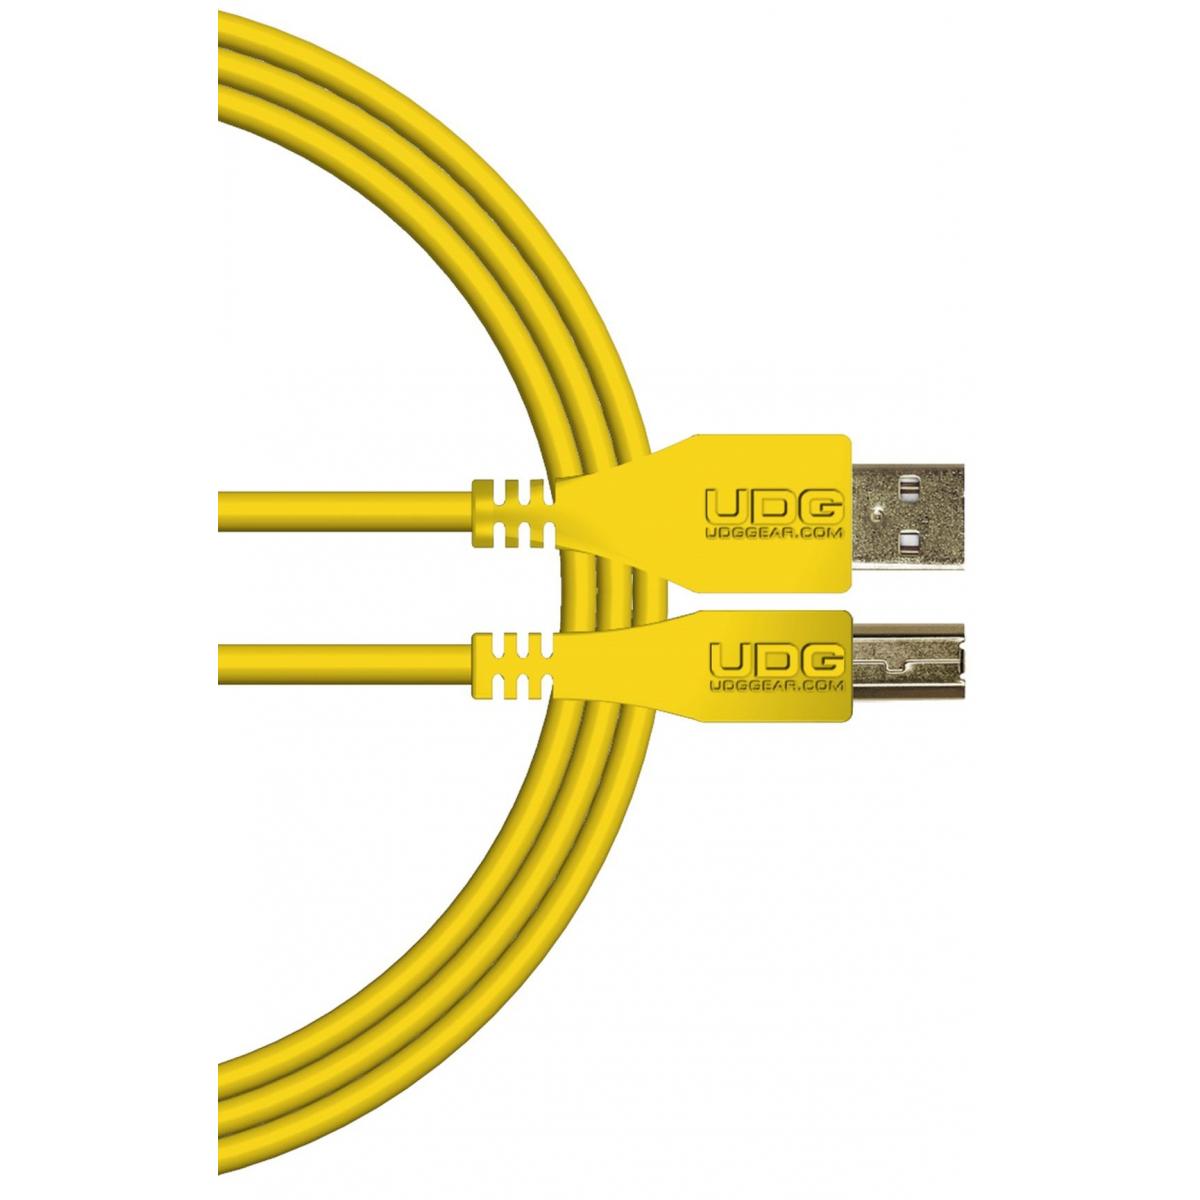 Câbles USB A vers B - UDG - U95001YL (1 mètre)